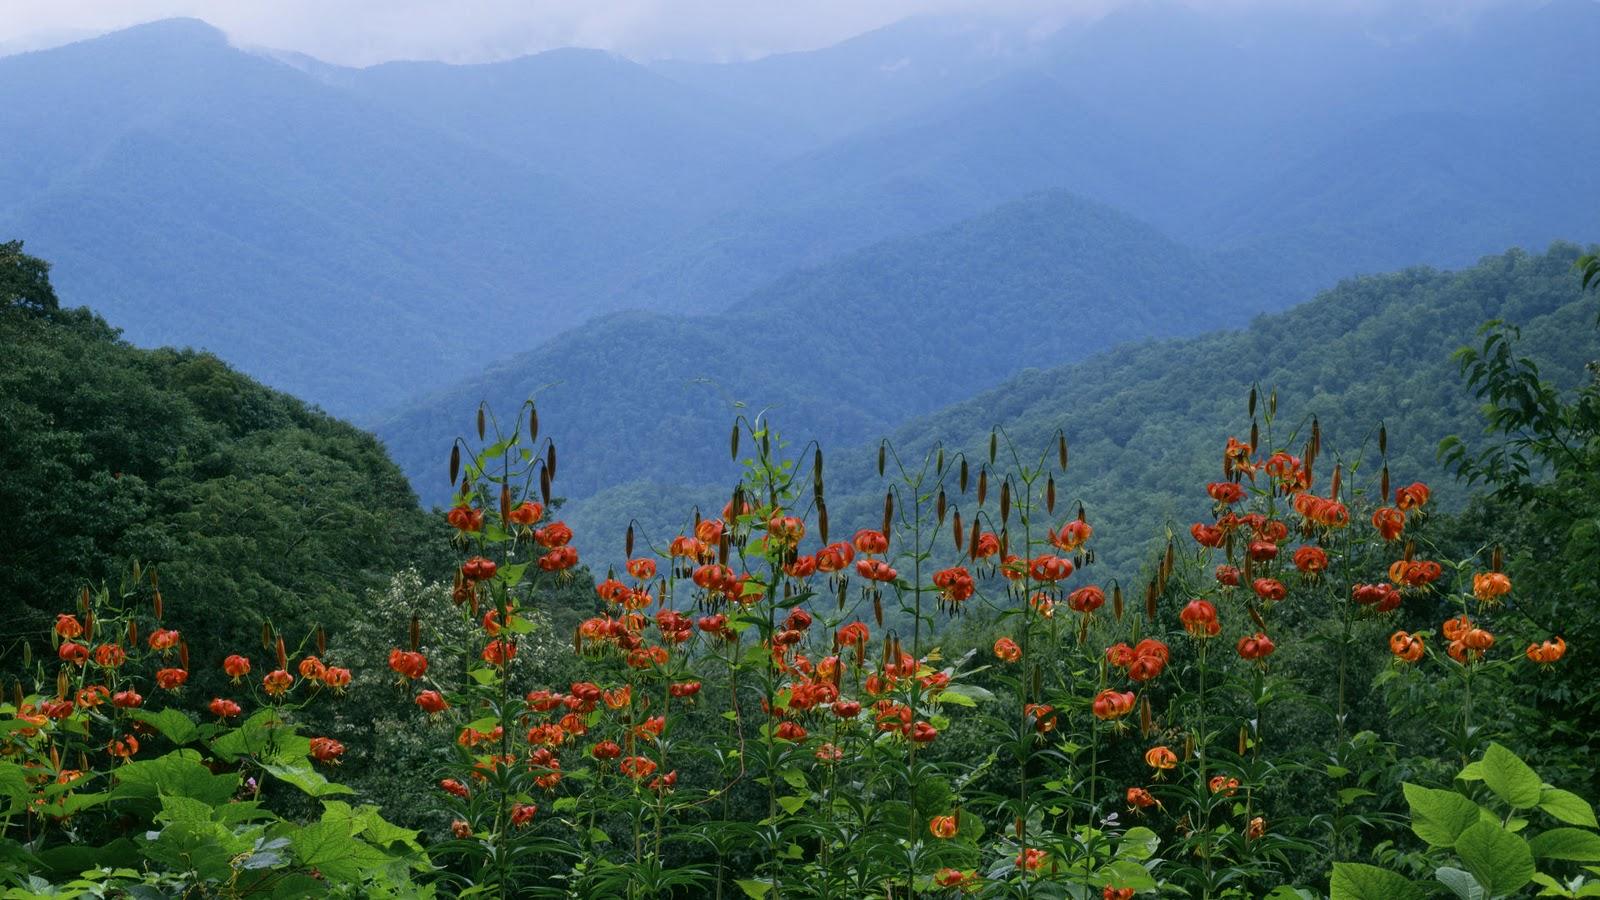 45] Smoky Mountains Spring Wallpaper on WallpaperSafari 1600x900